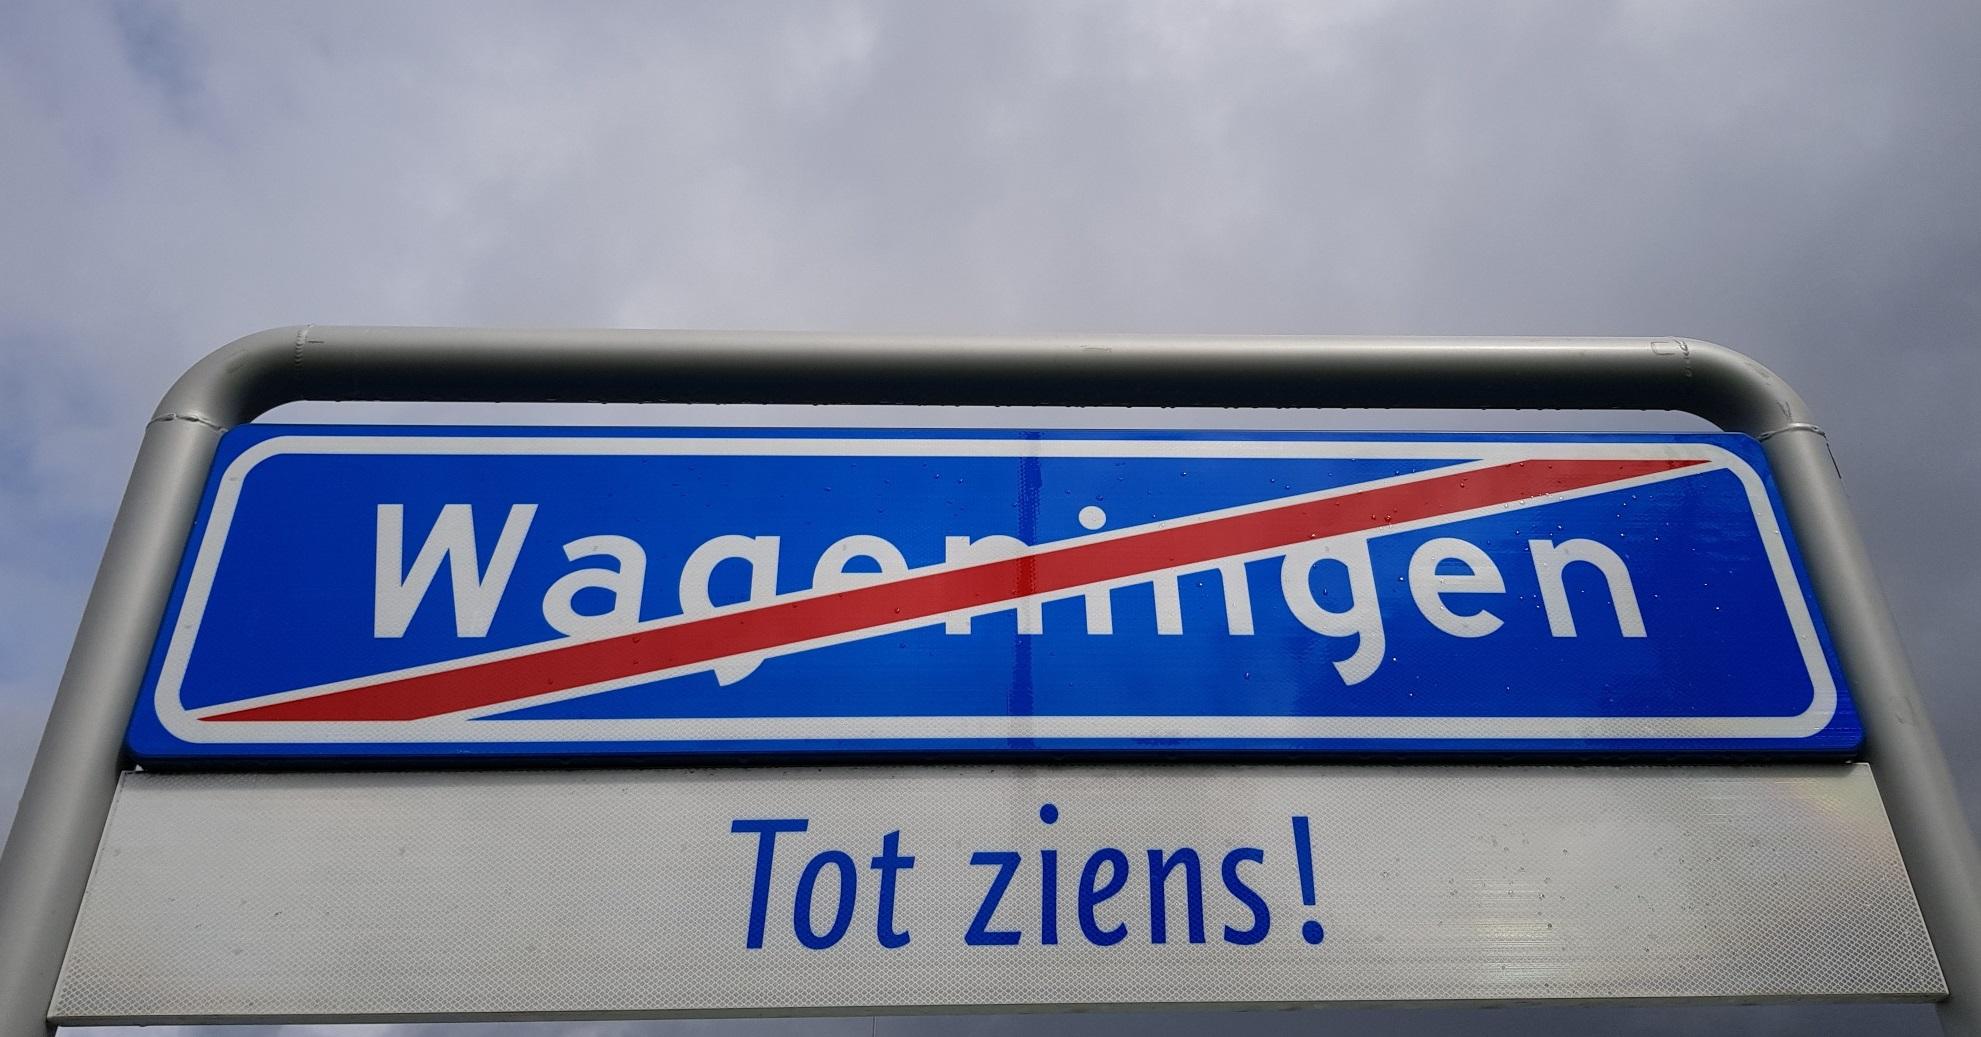 Please meet: WURgeningen